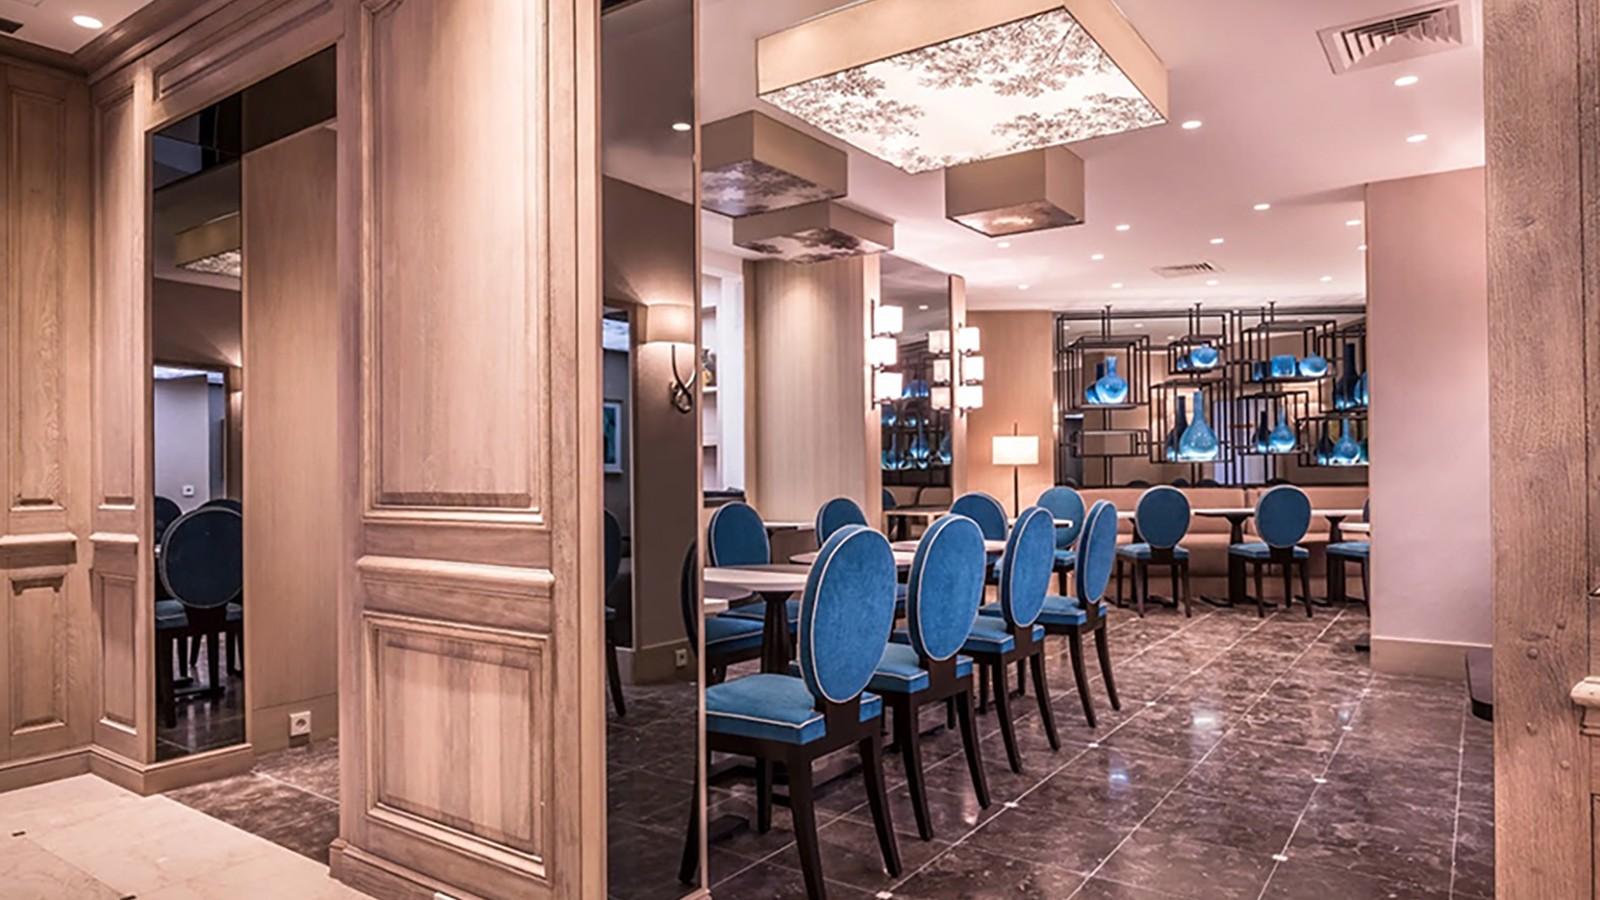 EFI Design Hotel Balmoral Paris Efi Design (12) 1182